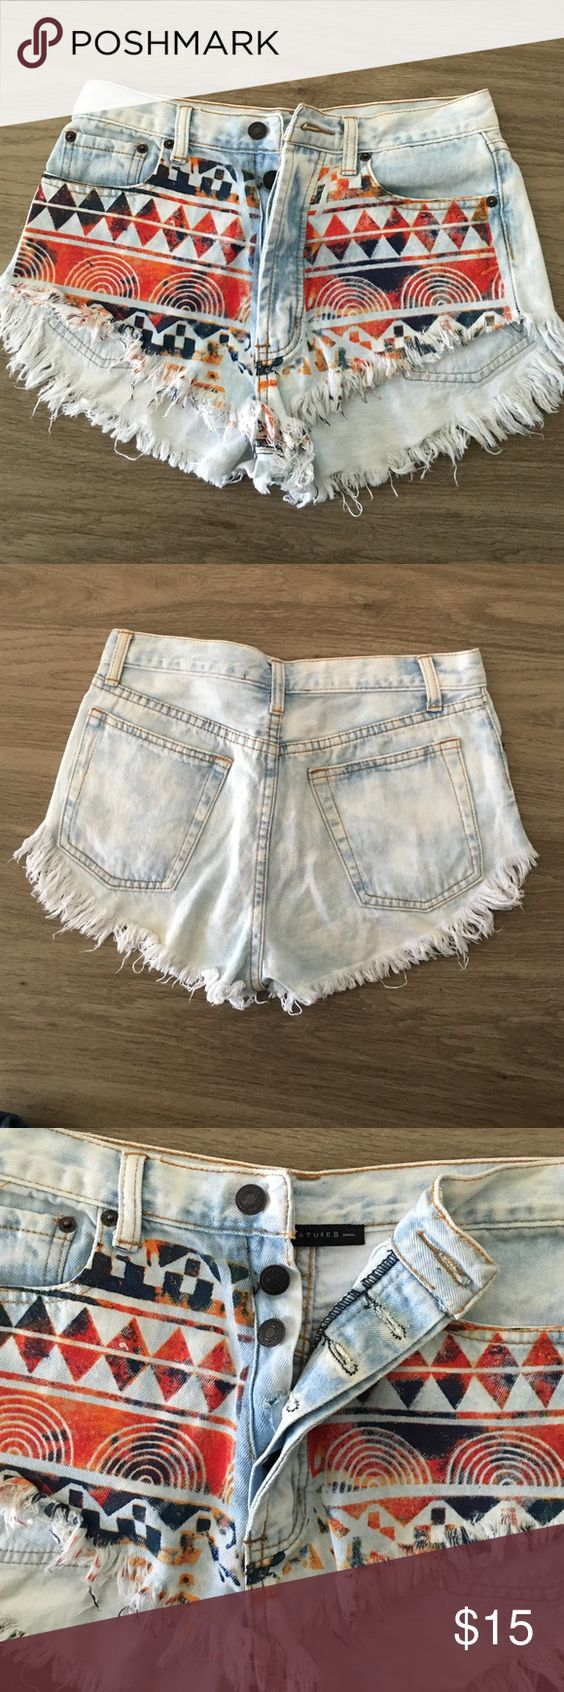 Tribal cutoff shorts Tribal shorts, size small. Good condition missing third button Shorts Jean Shorts